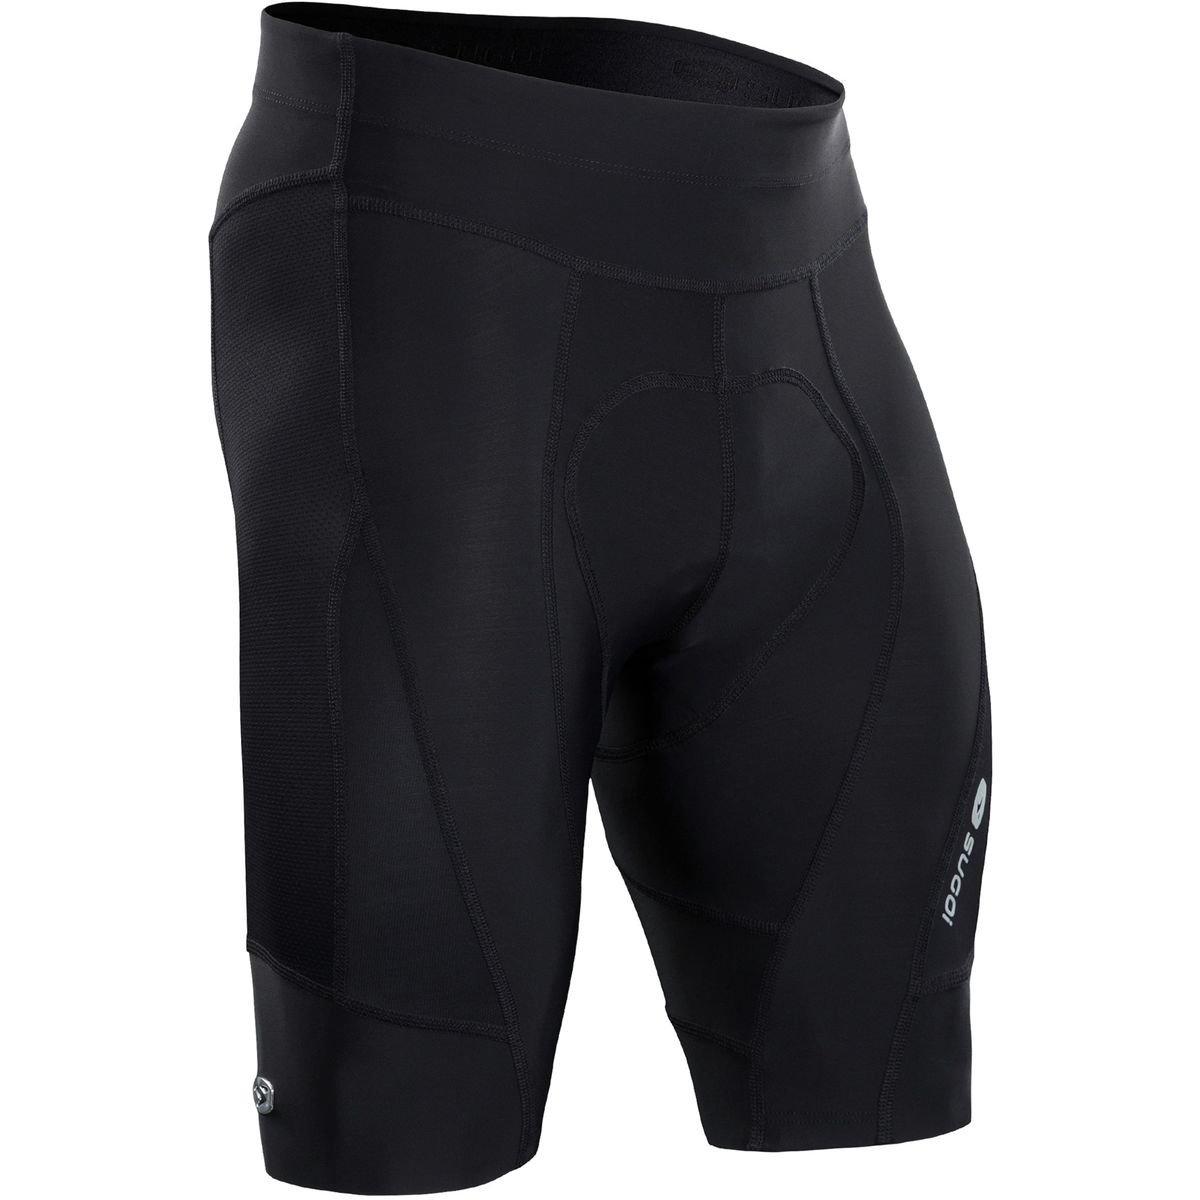 SUGOi RS Pro Short - Men's Black, S by SUGOi (Image #1)